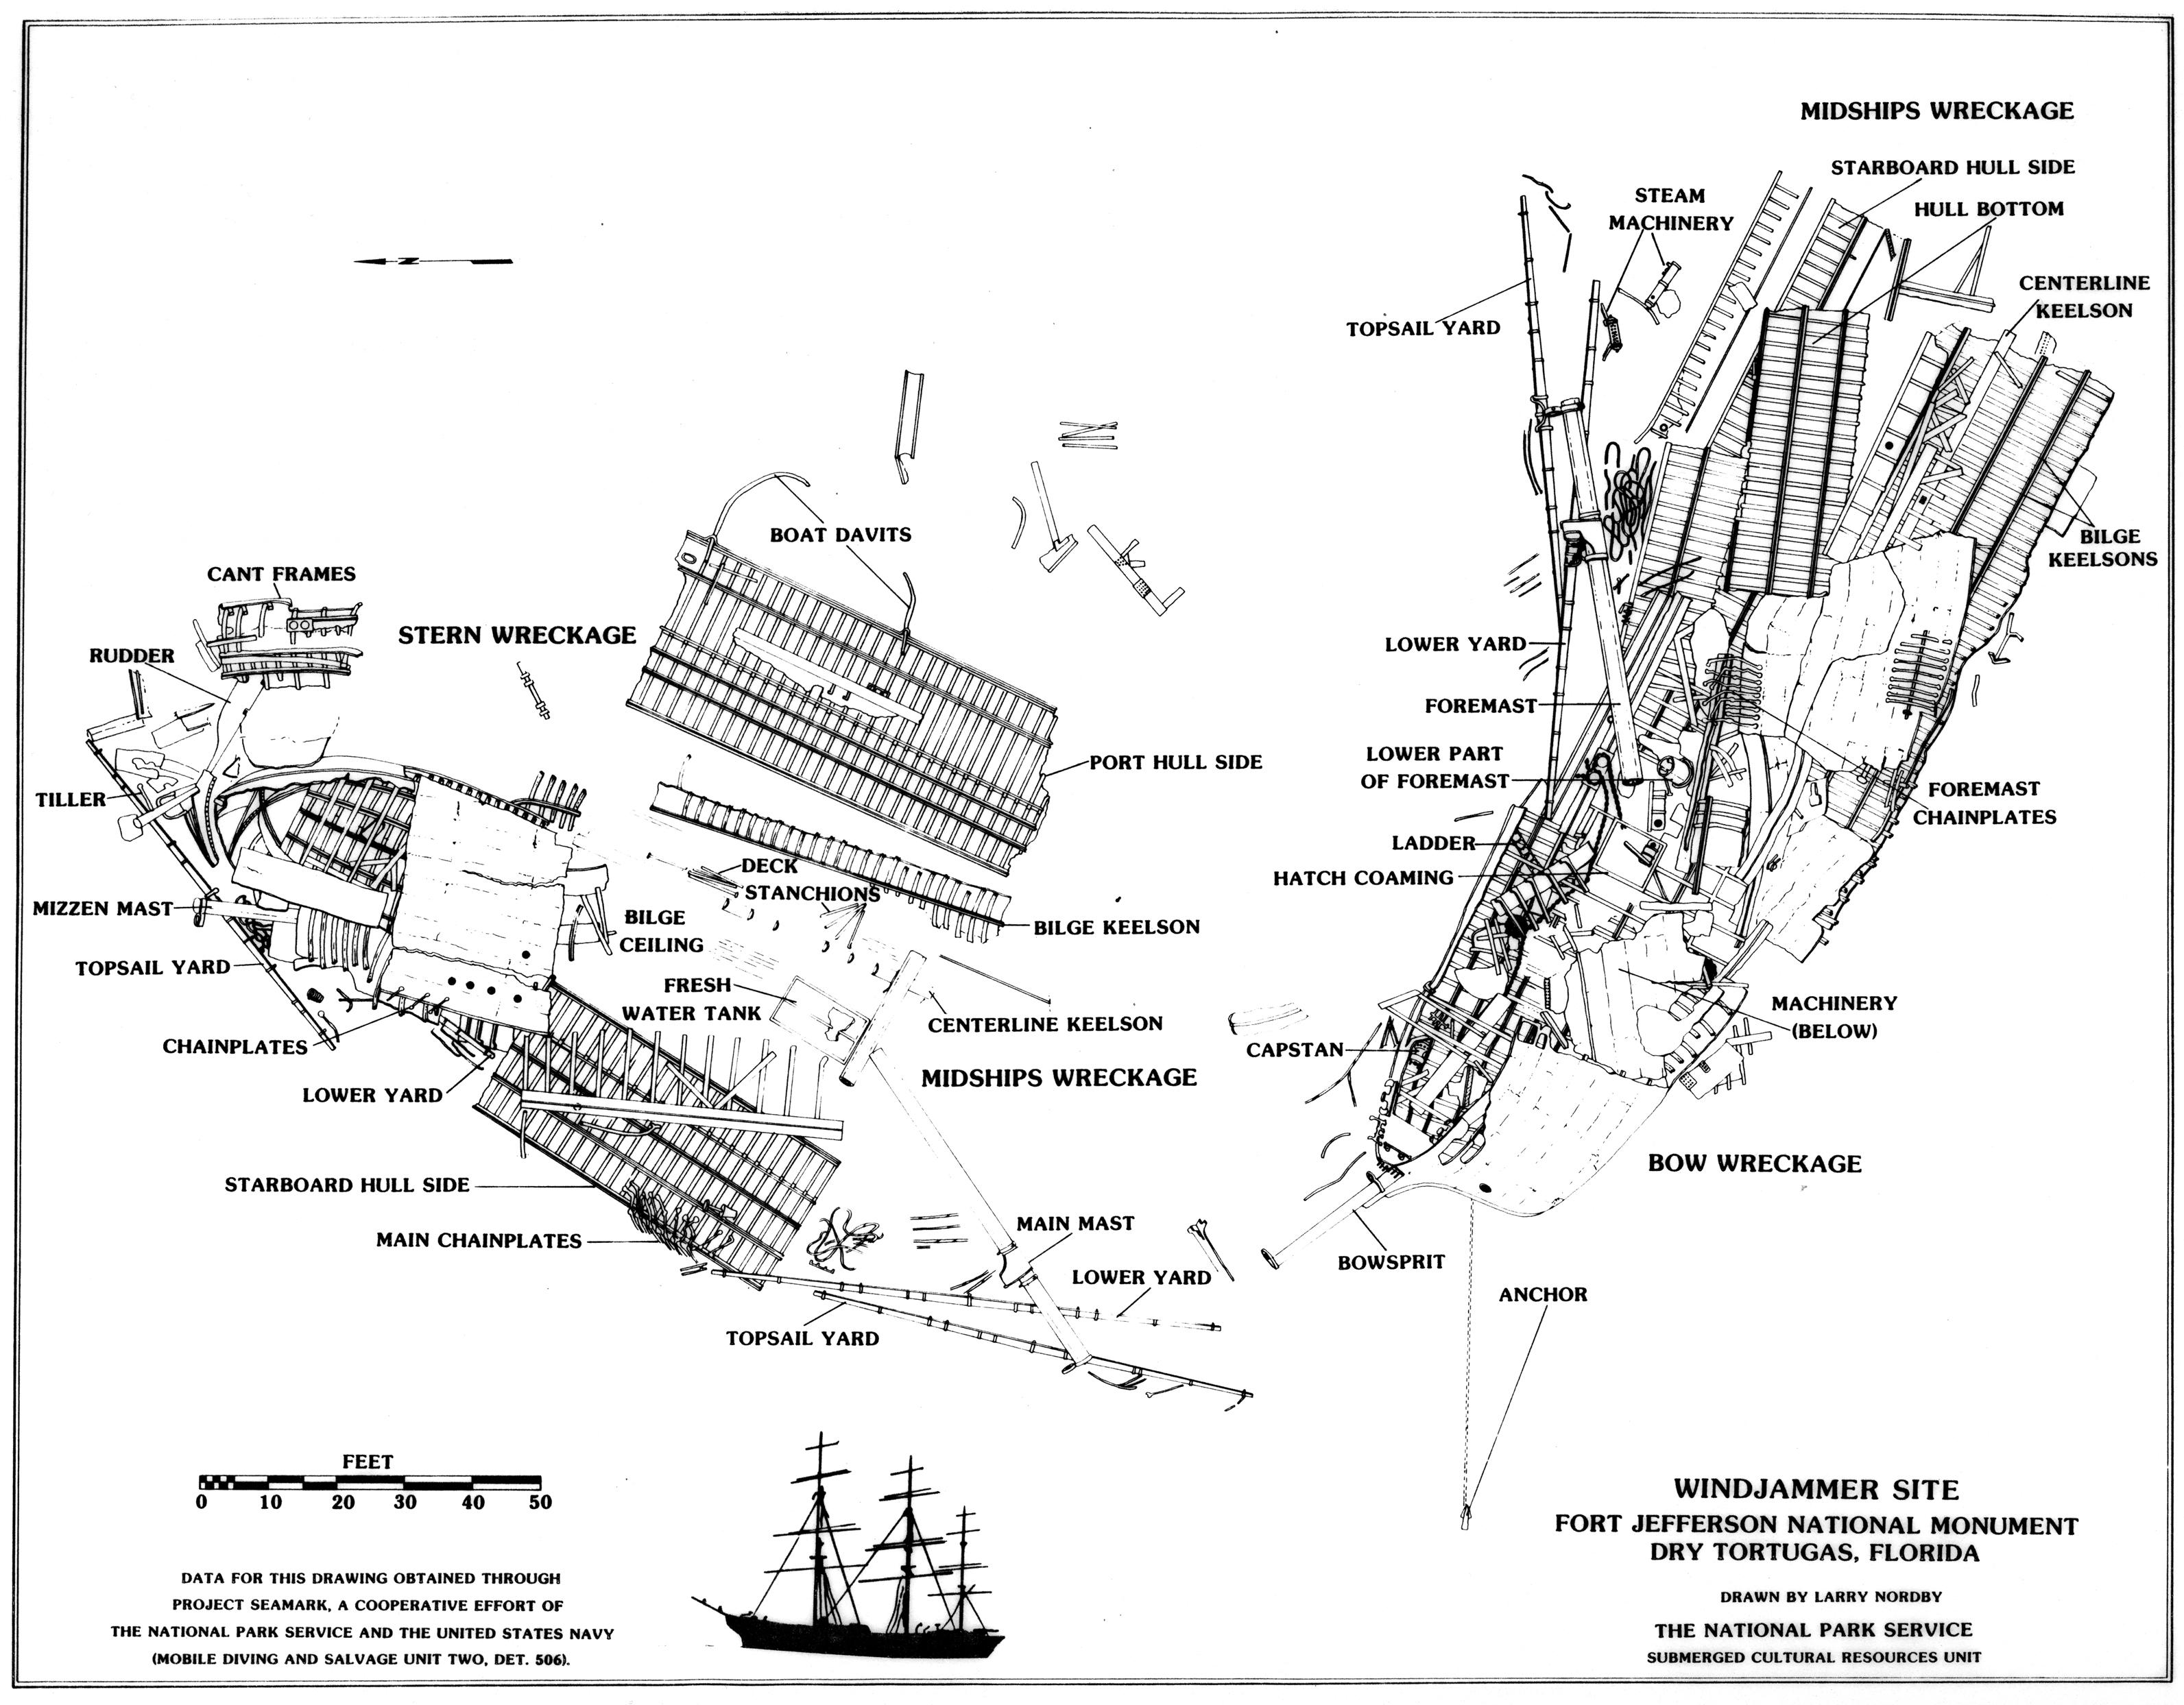 The Windjammer Wreck